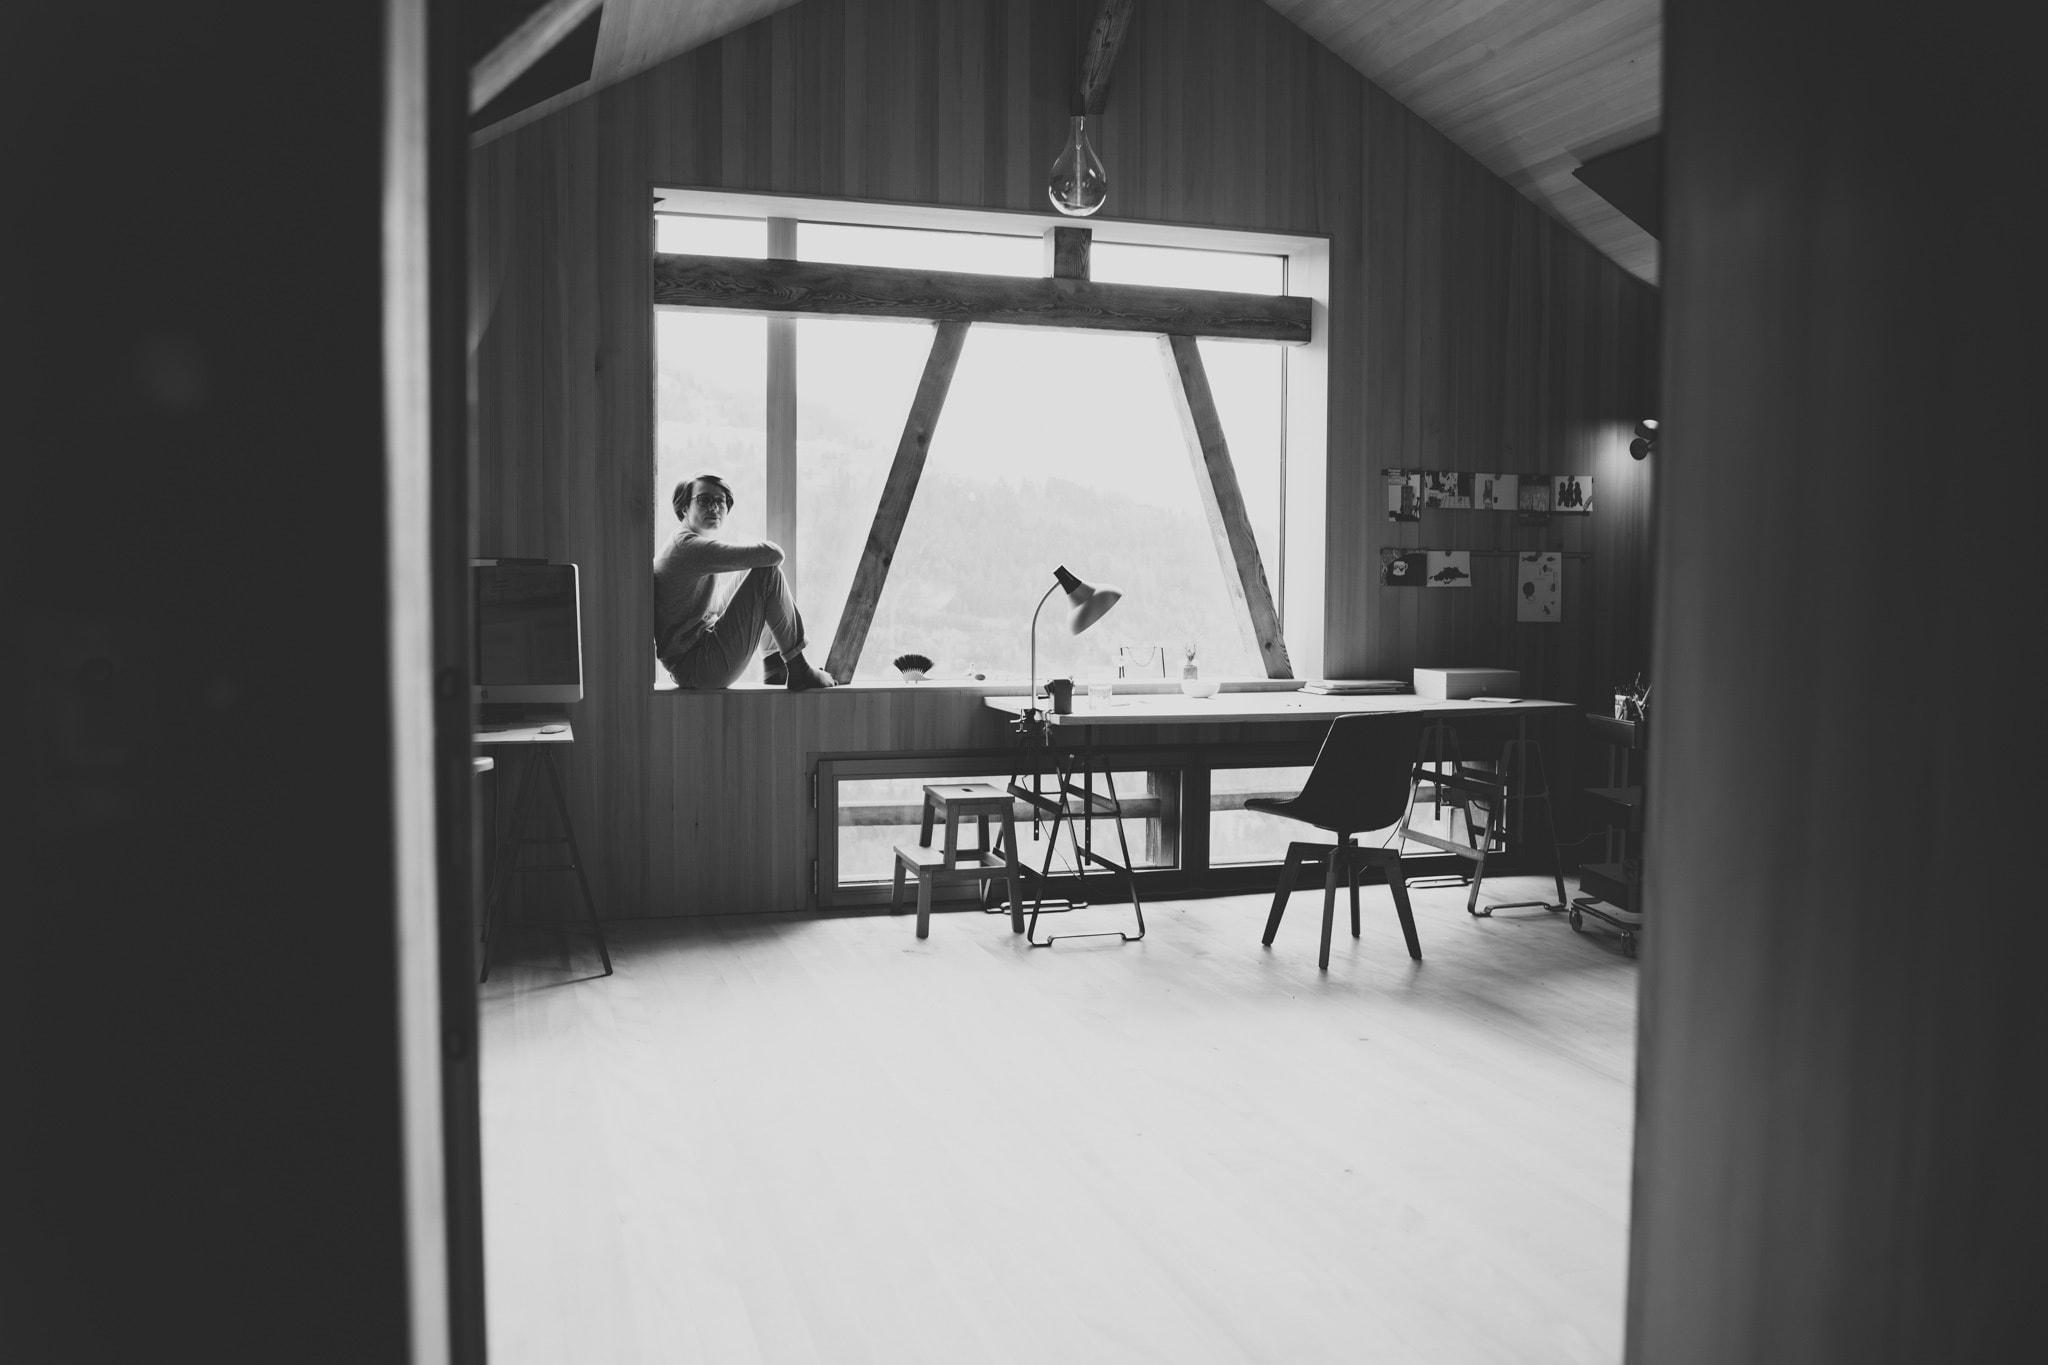 artist studio, vorarlberg, illustrations and drawing, wood, view, mountains, anna stemmer dworak